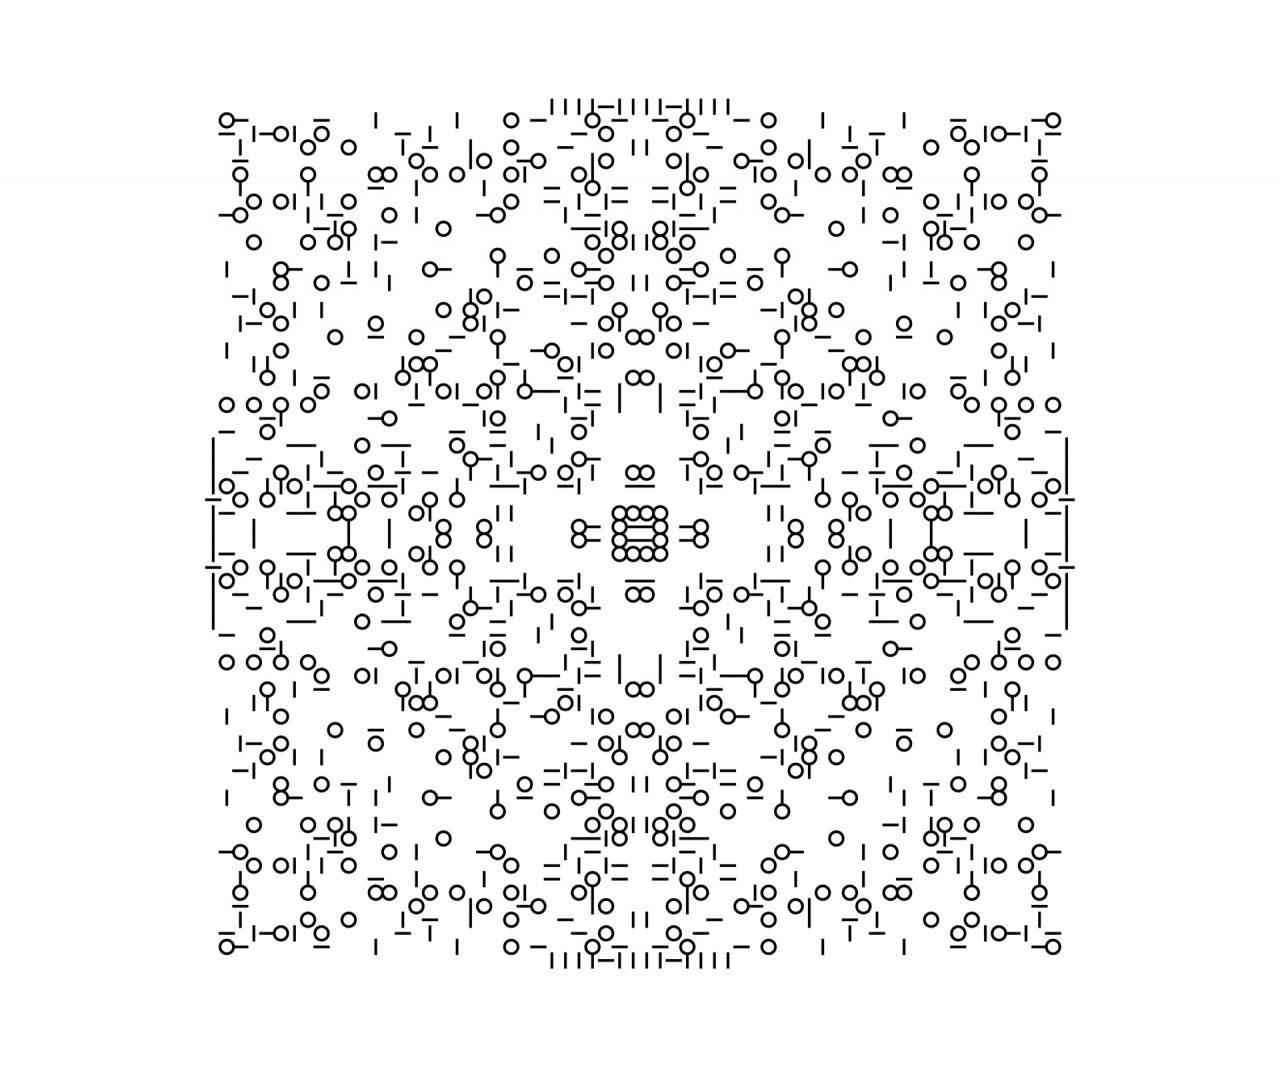 Black pixels against white background form a pattern